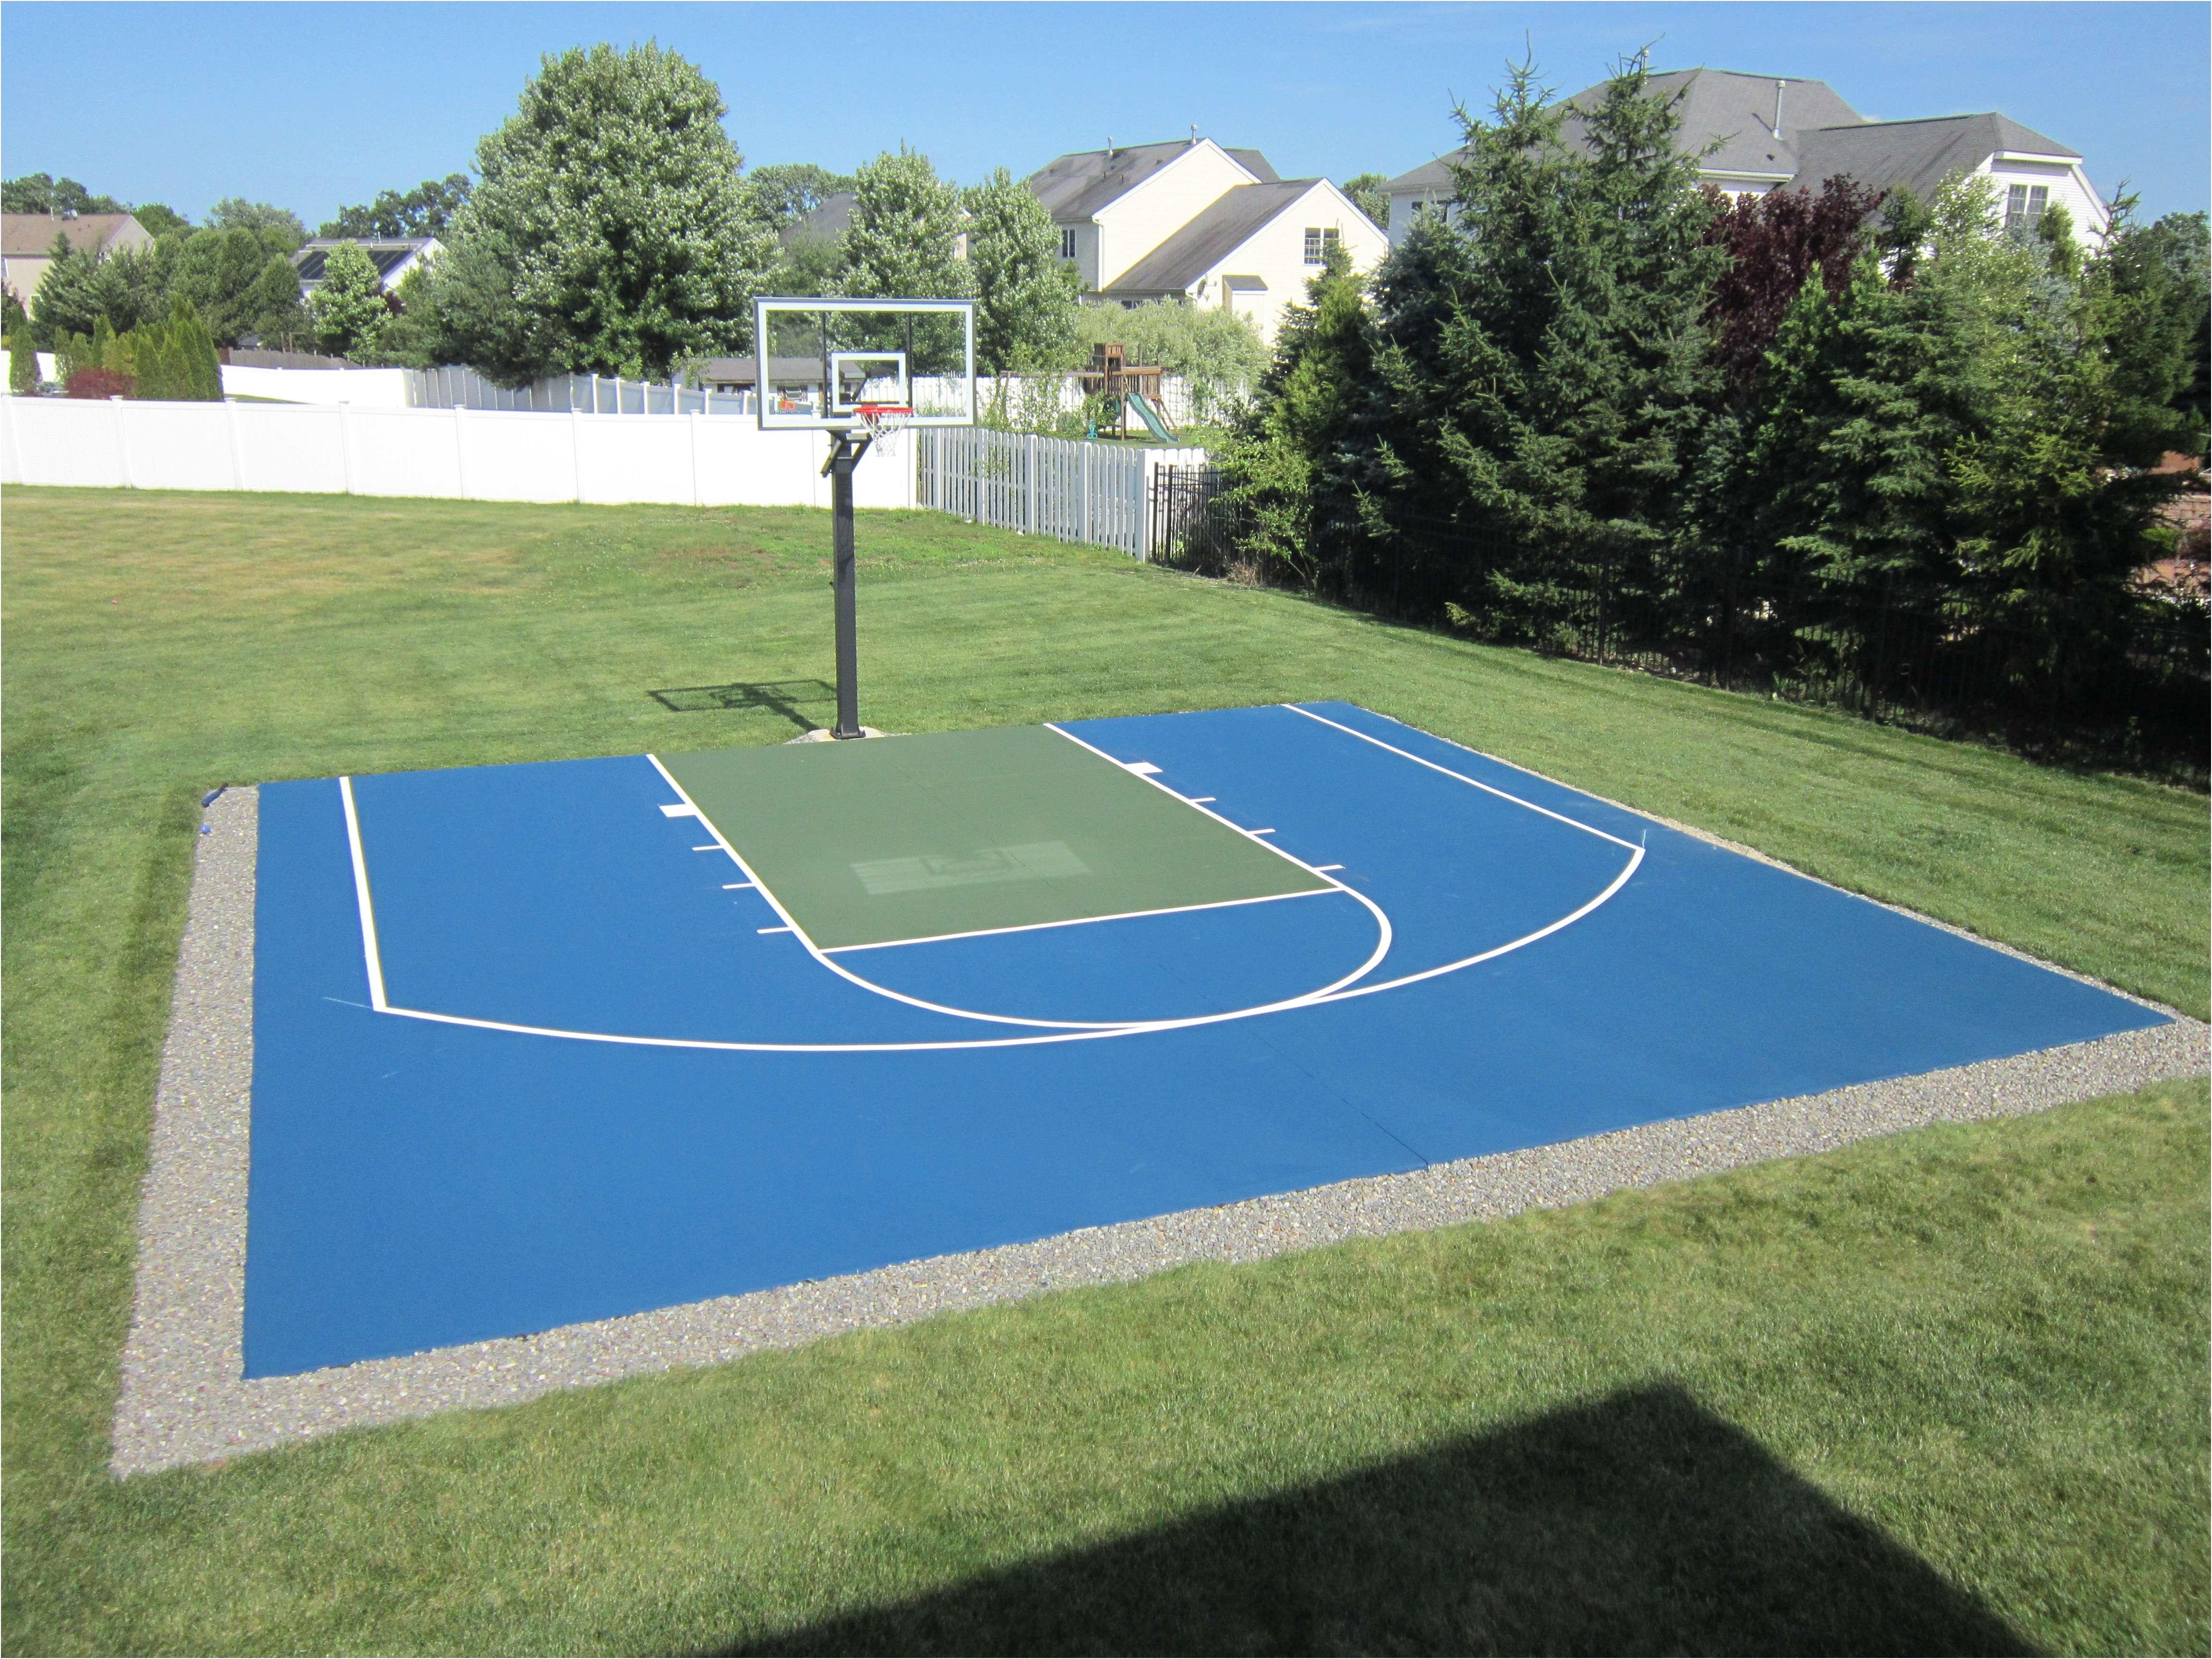 backyard basketball court paving inspirational cheap outdoor basketball court flooring lovely e side od a of